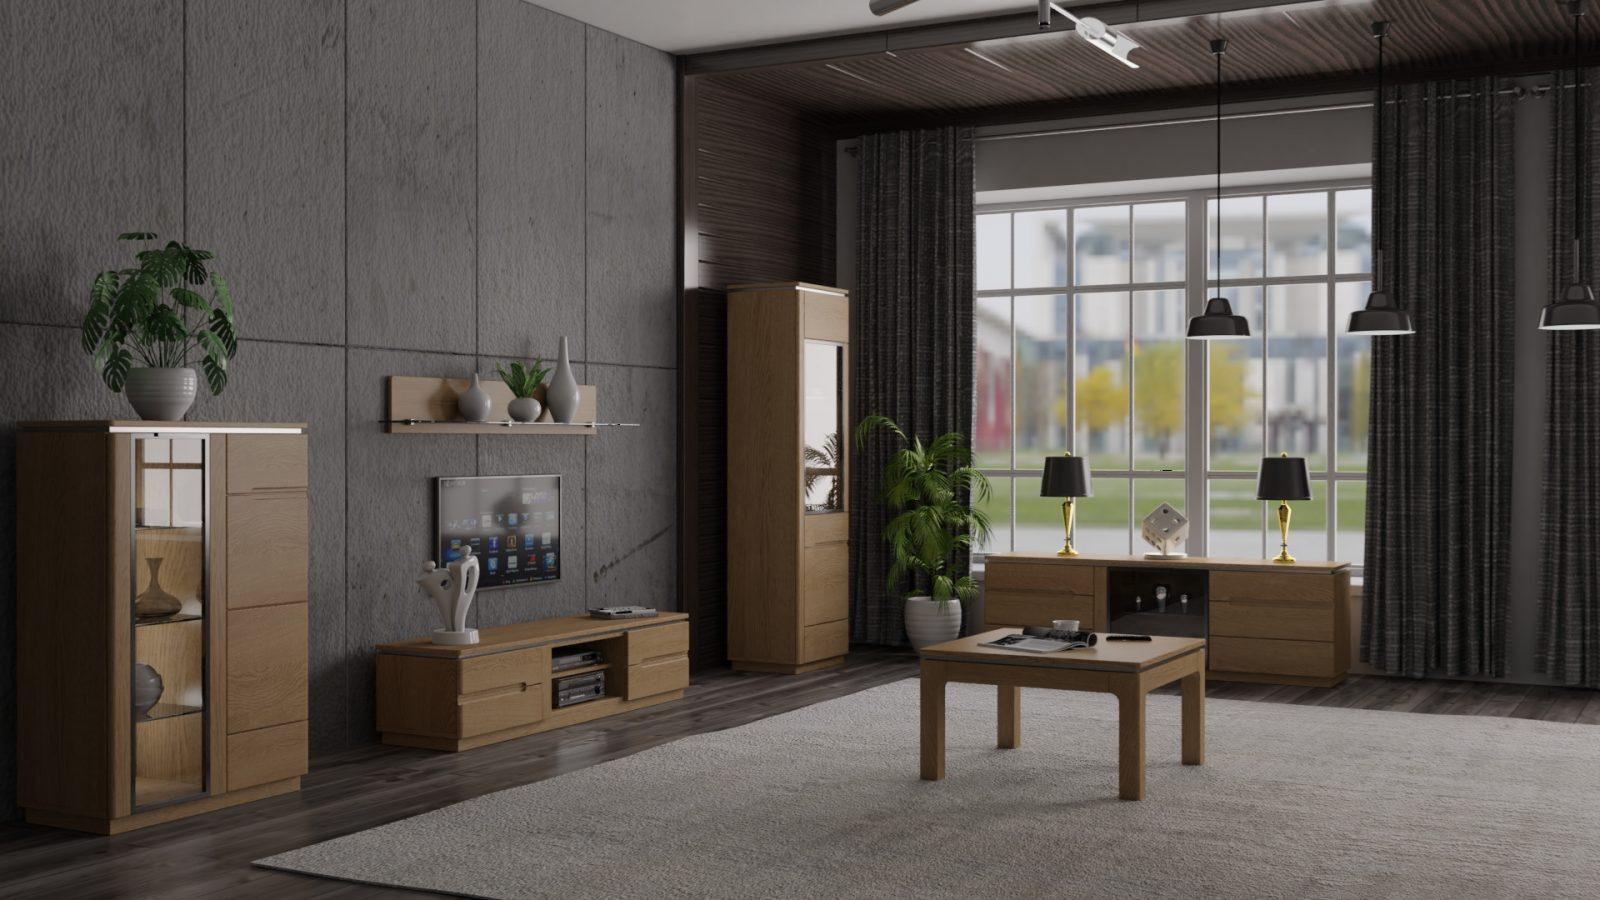 montenegro קולקציה רהיטים לסלון בסגנון מודרני